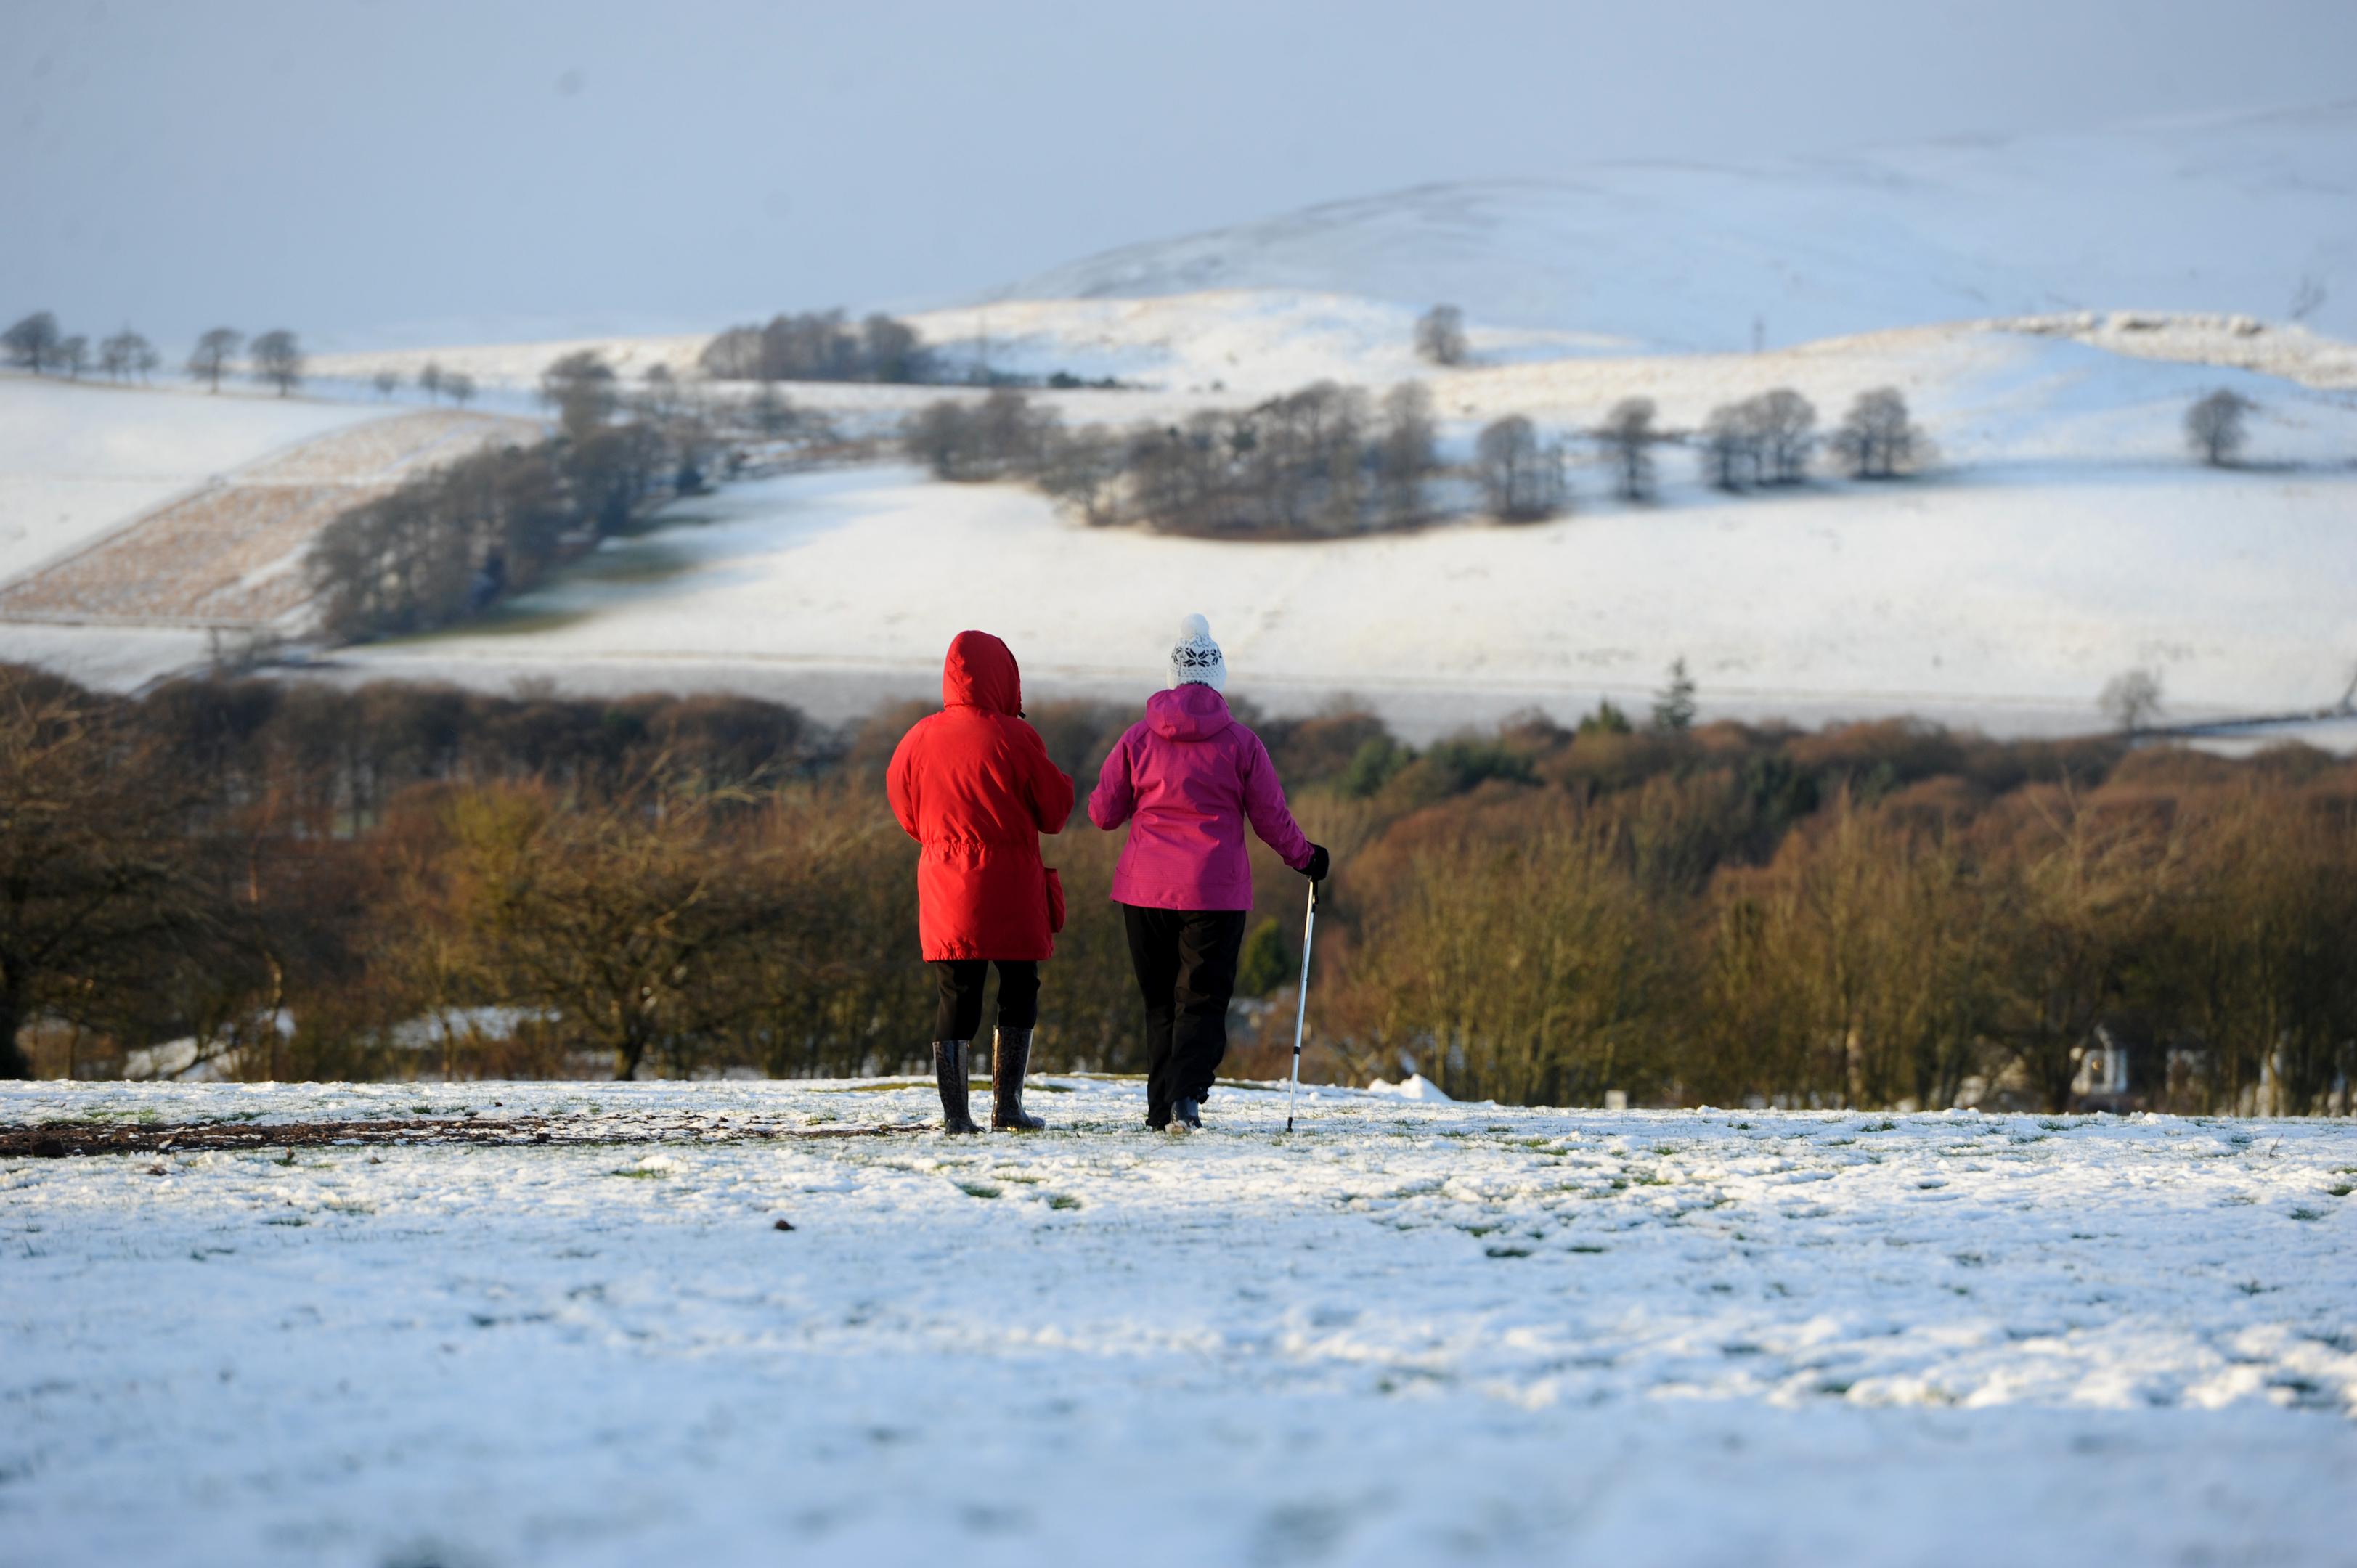 Snow in Kirriemuir (Kim Cessford / D C Thomson)